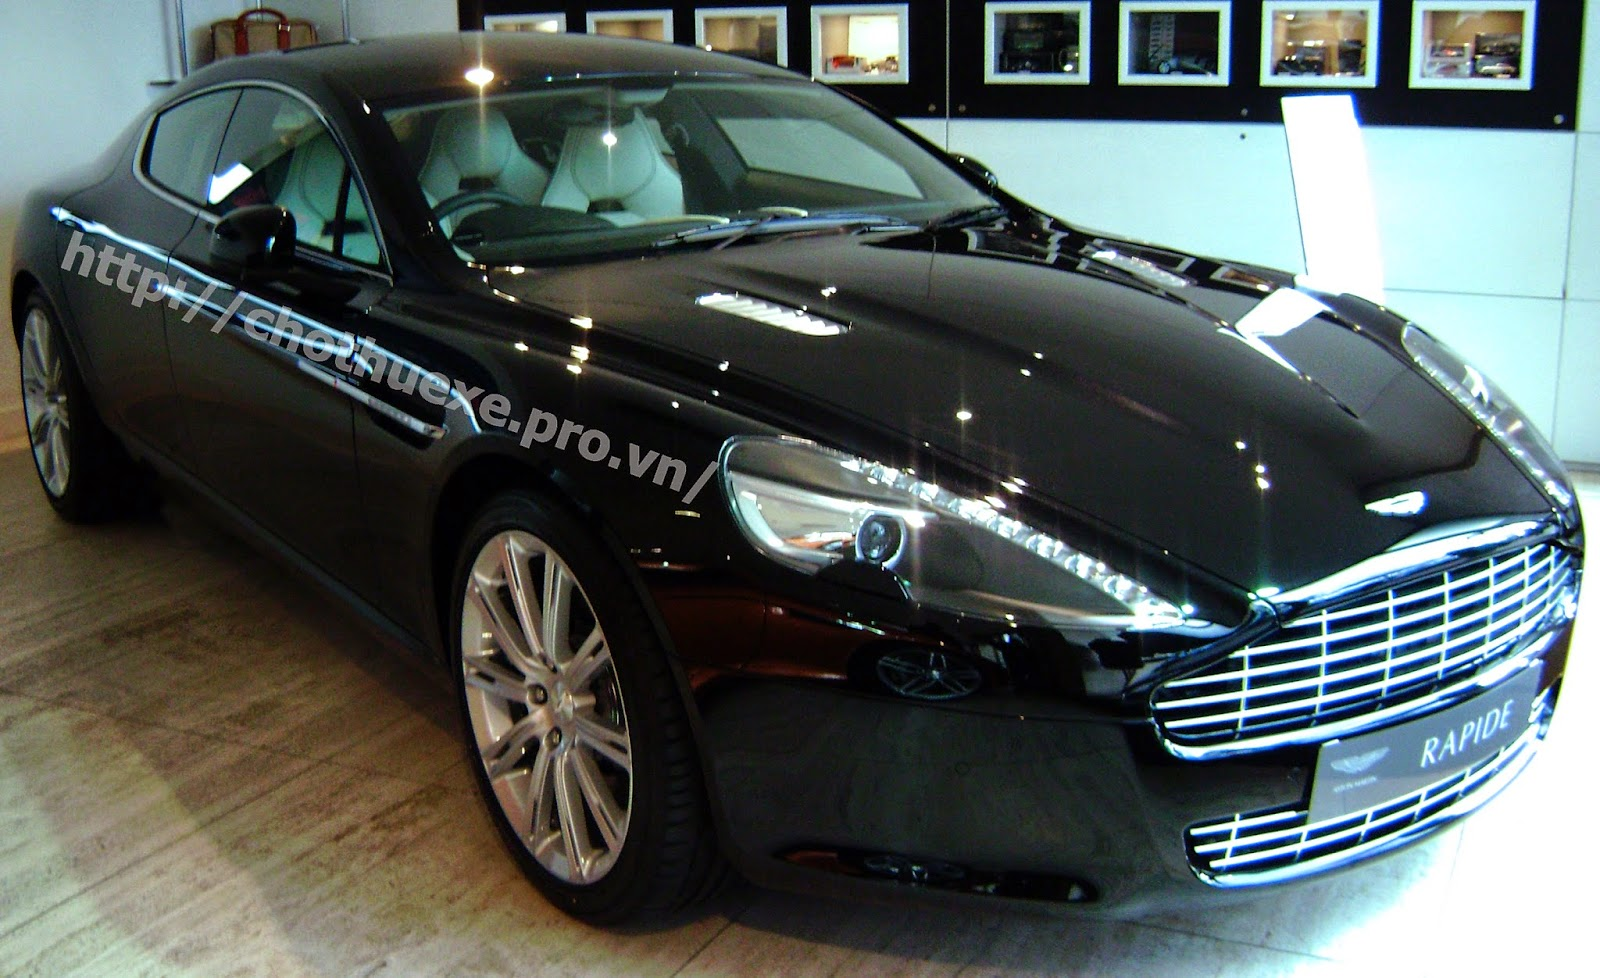 Cho thuê siêu xe Aston Martin Rapide